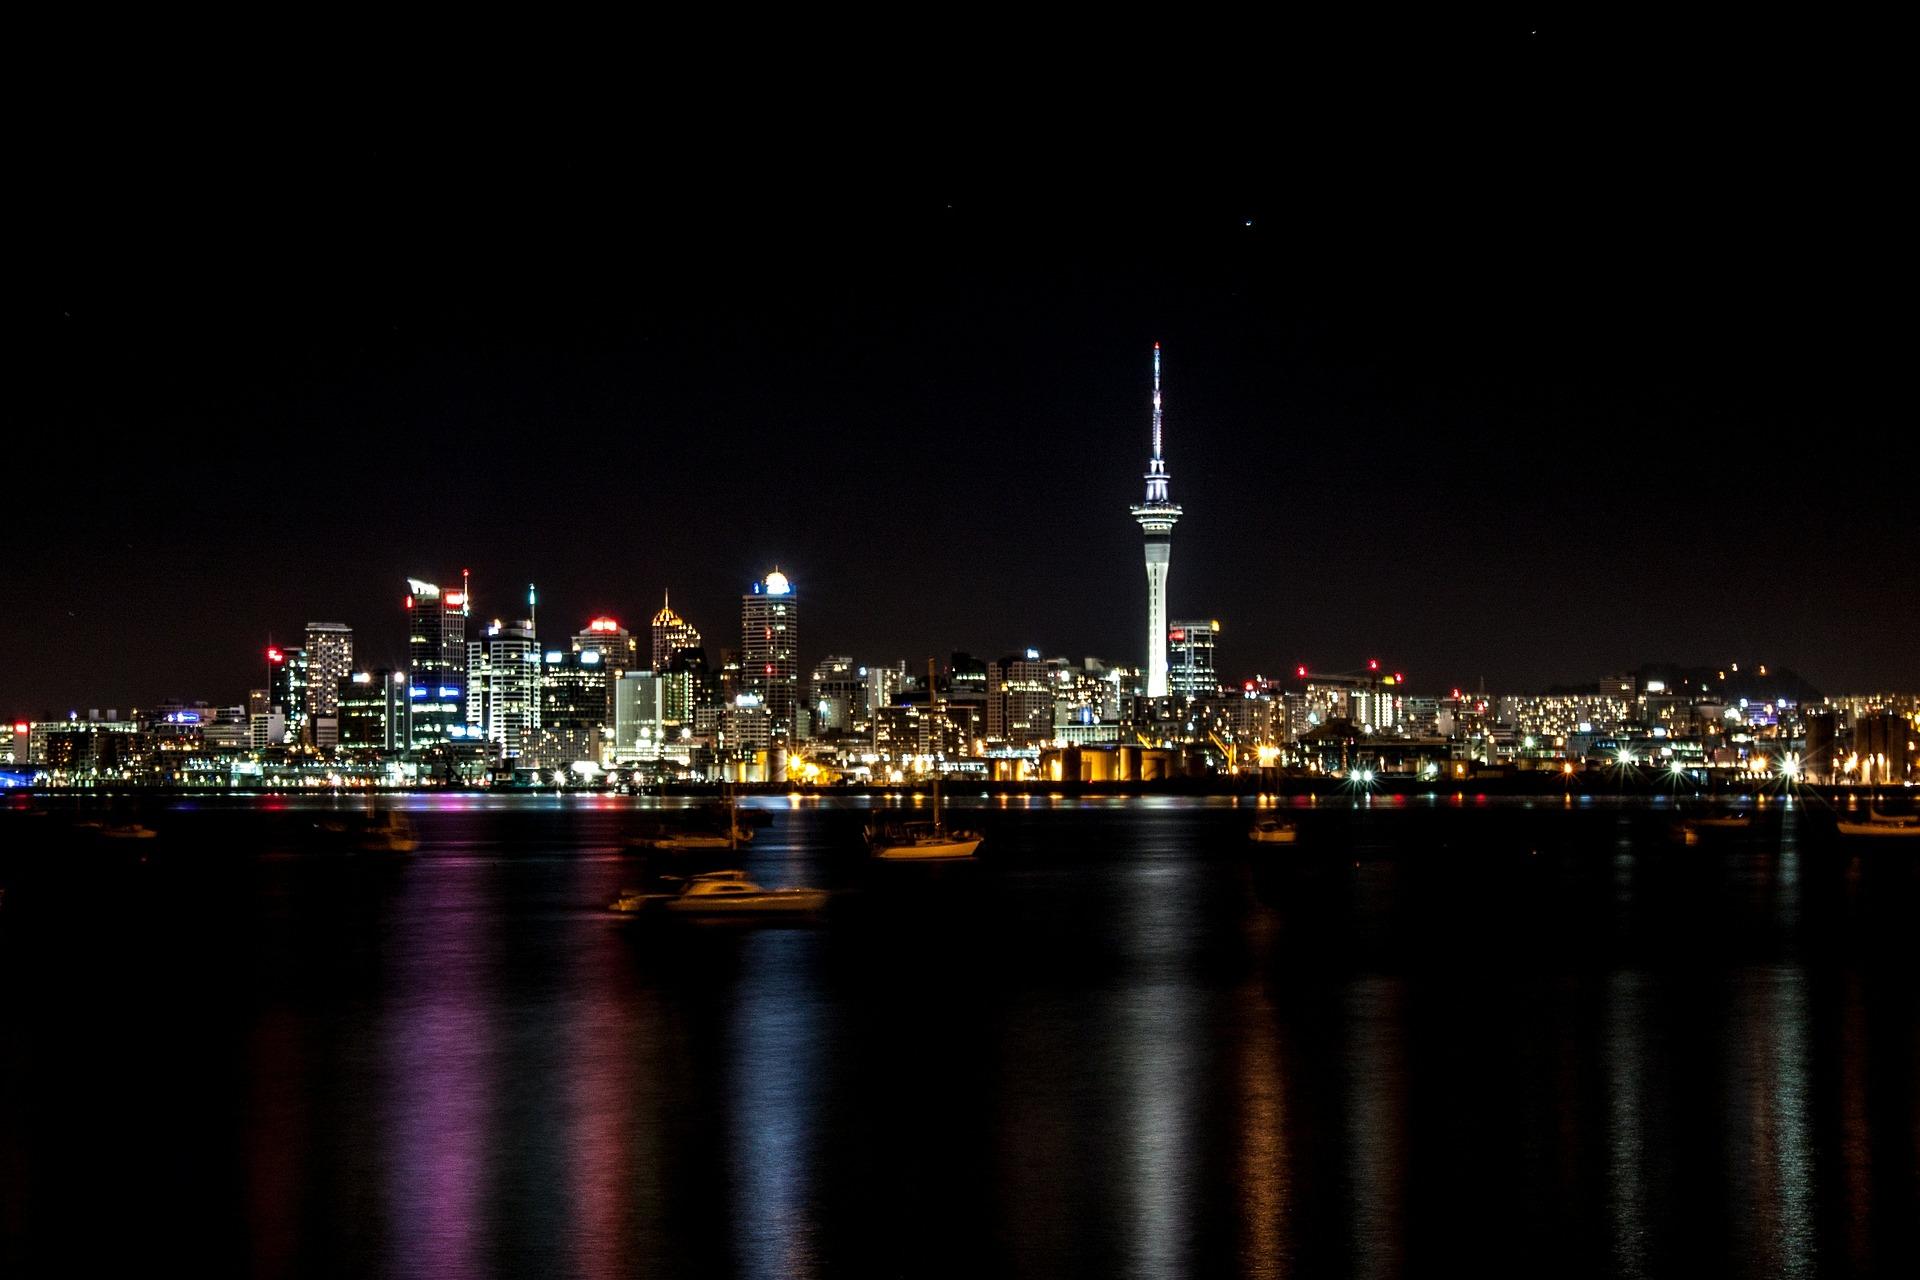 night-461707_1920.jpg